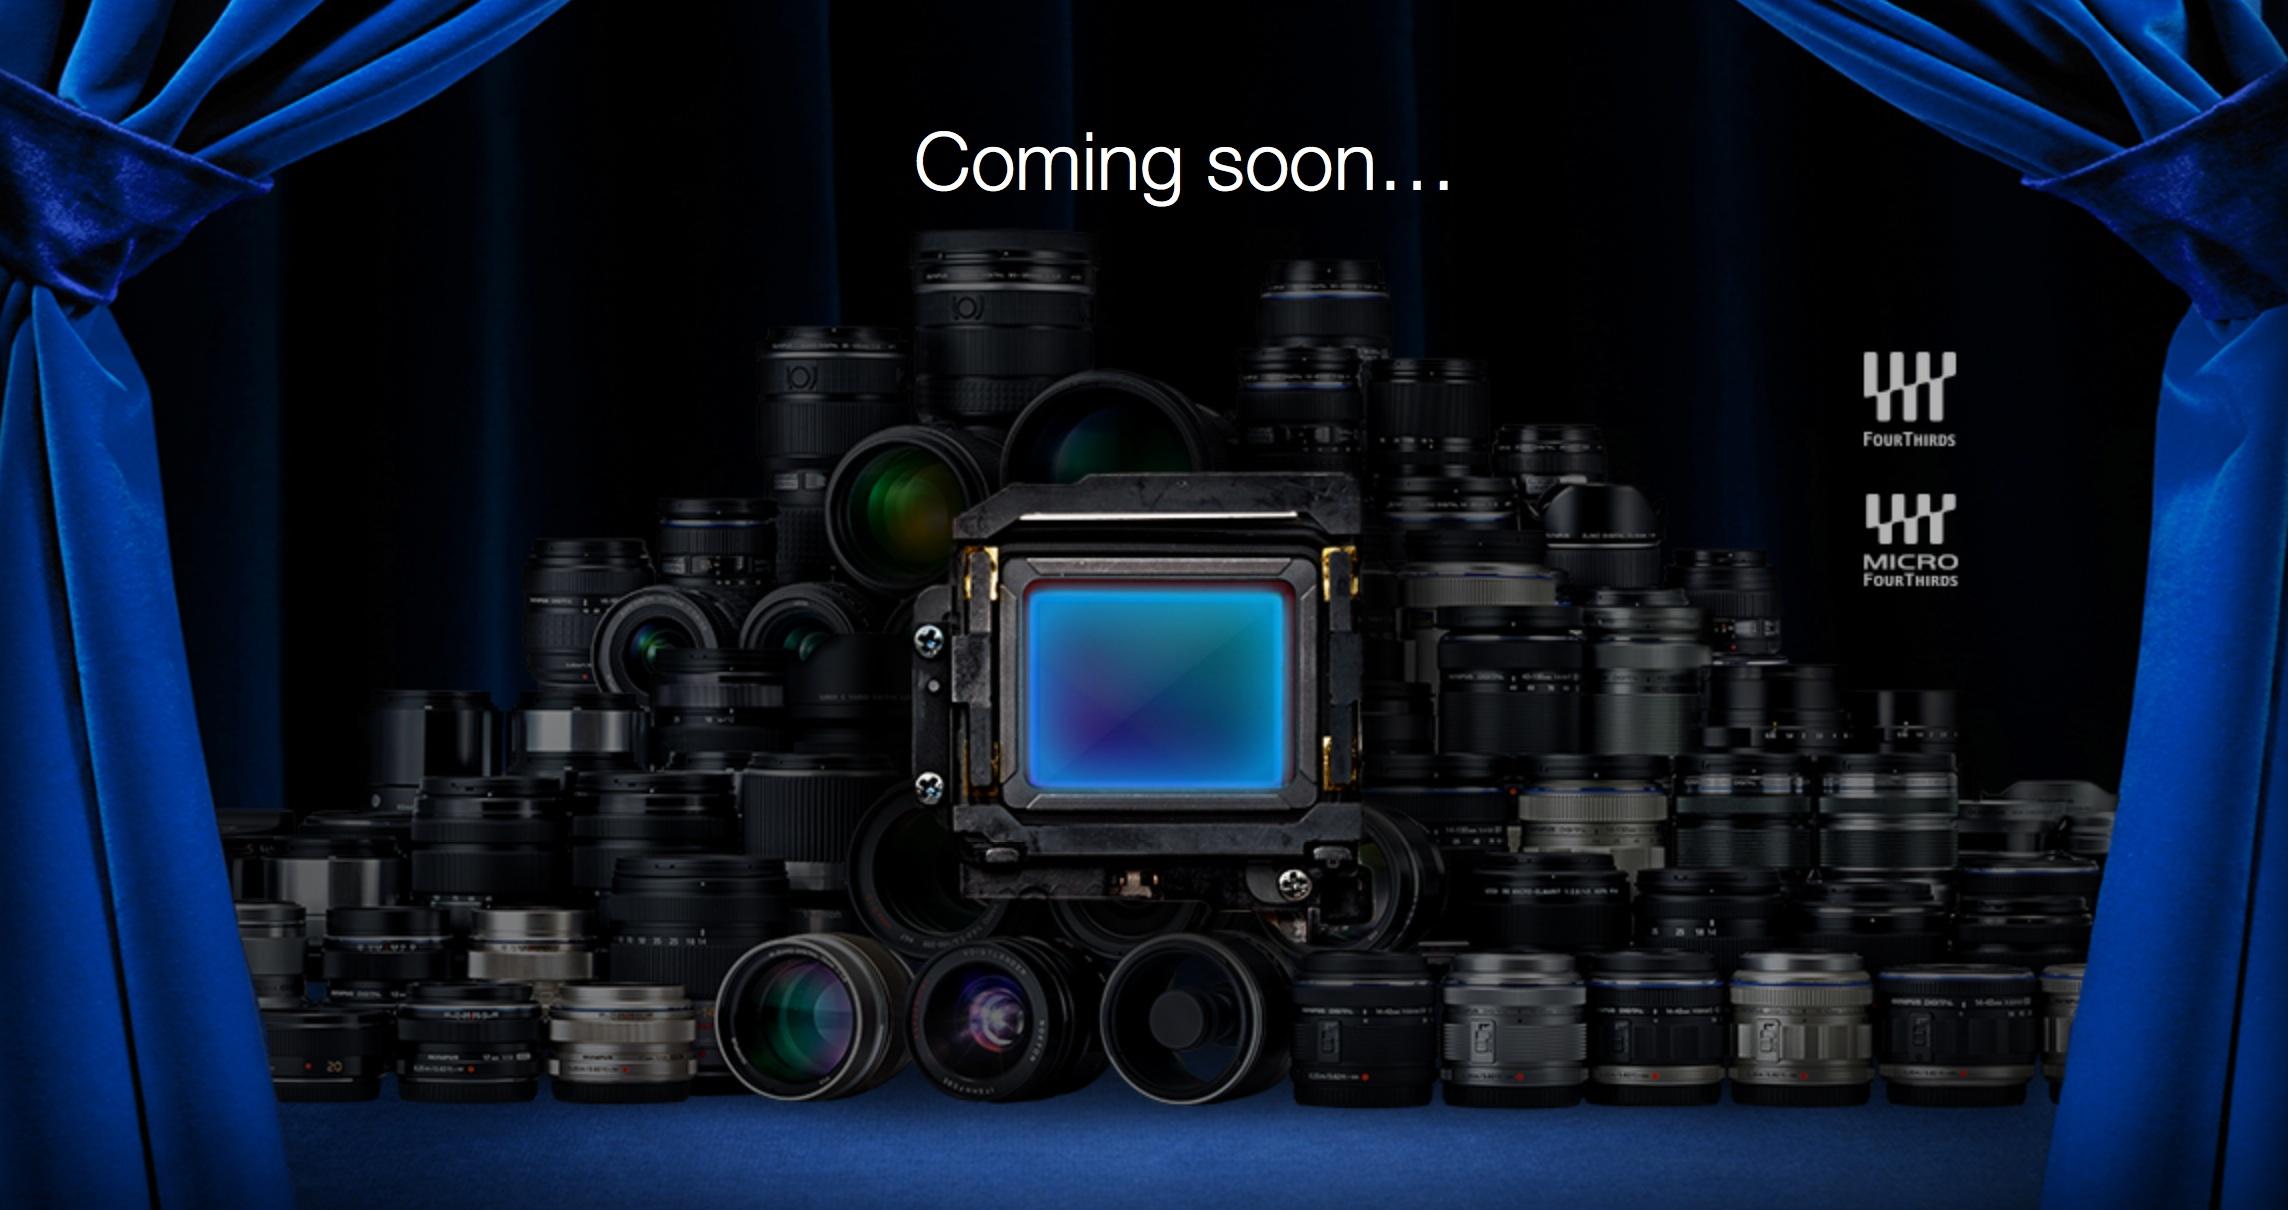 http://thedigitalstory.com/2013/08/28/olympus-teaser.jpg